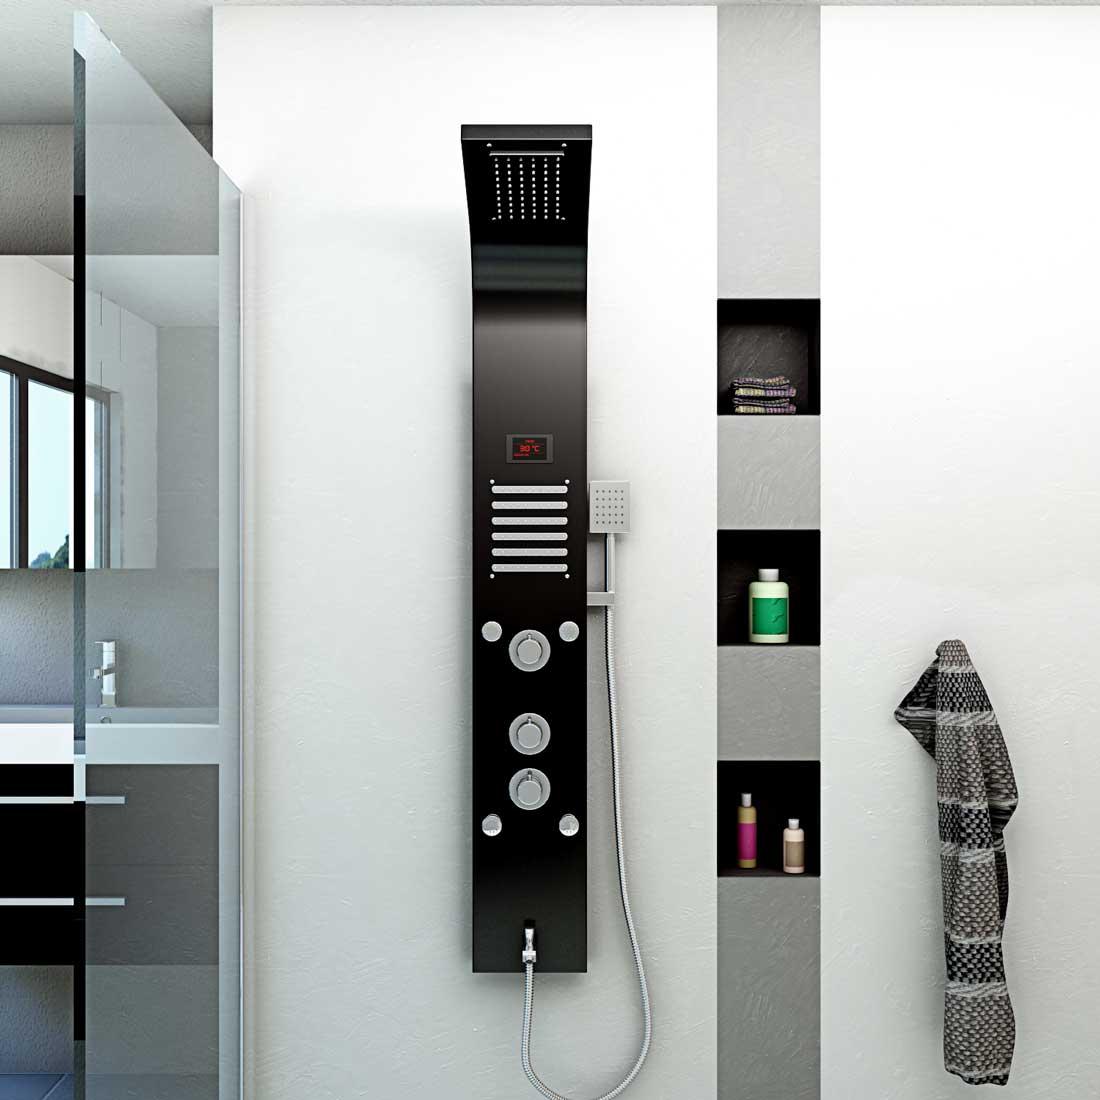 duschpaneel aus edelstahl duschs ule duscharmatur thermostat farbe schwarz dp01. Black Bedroom Furniture Sets. Home Design Ideas